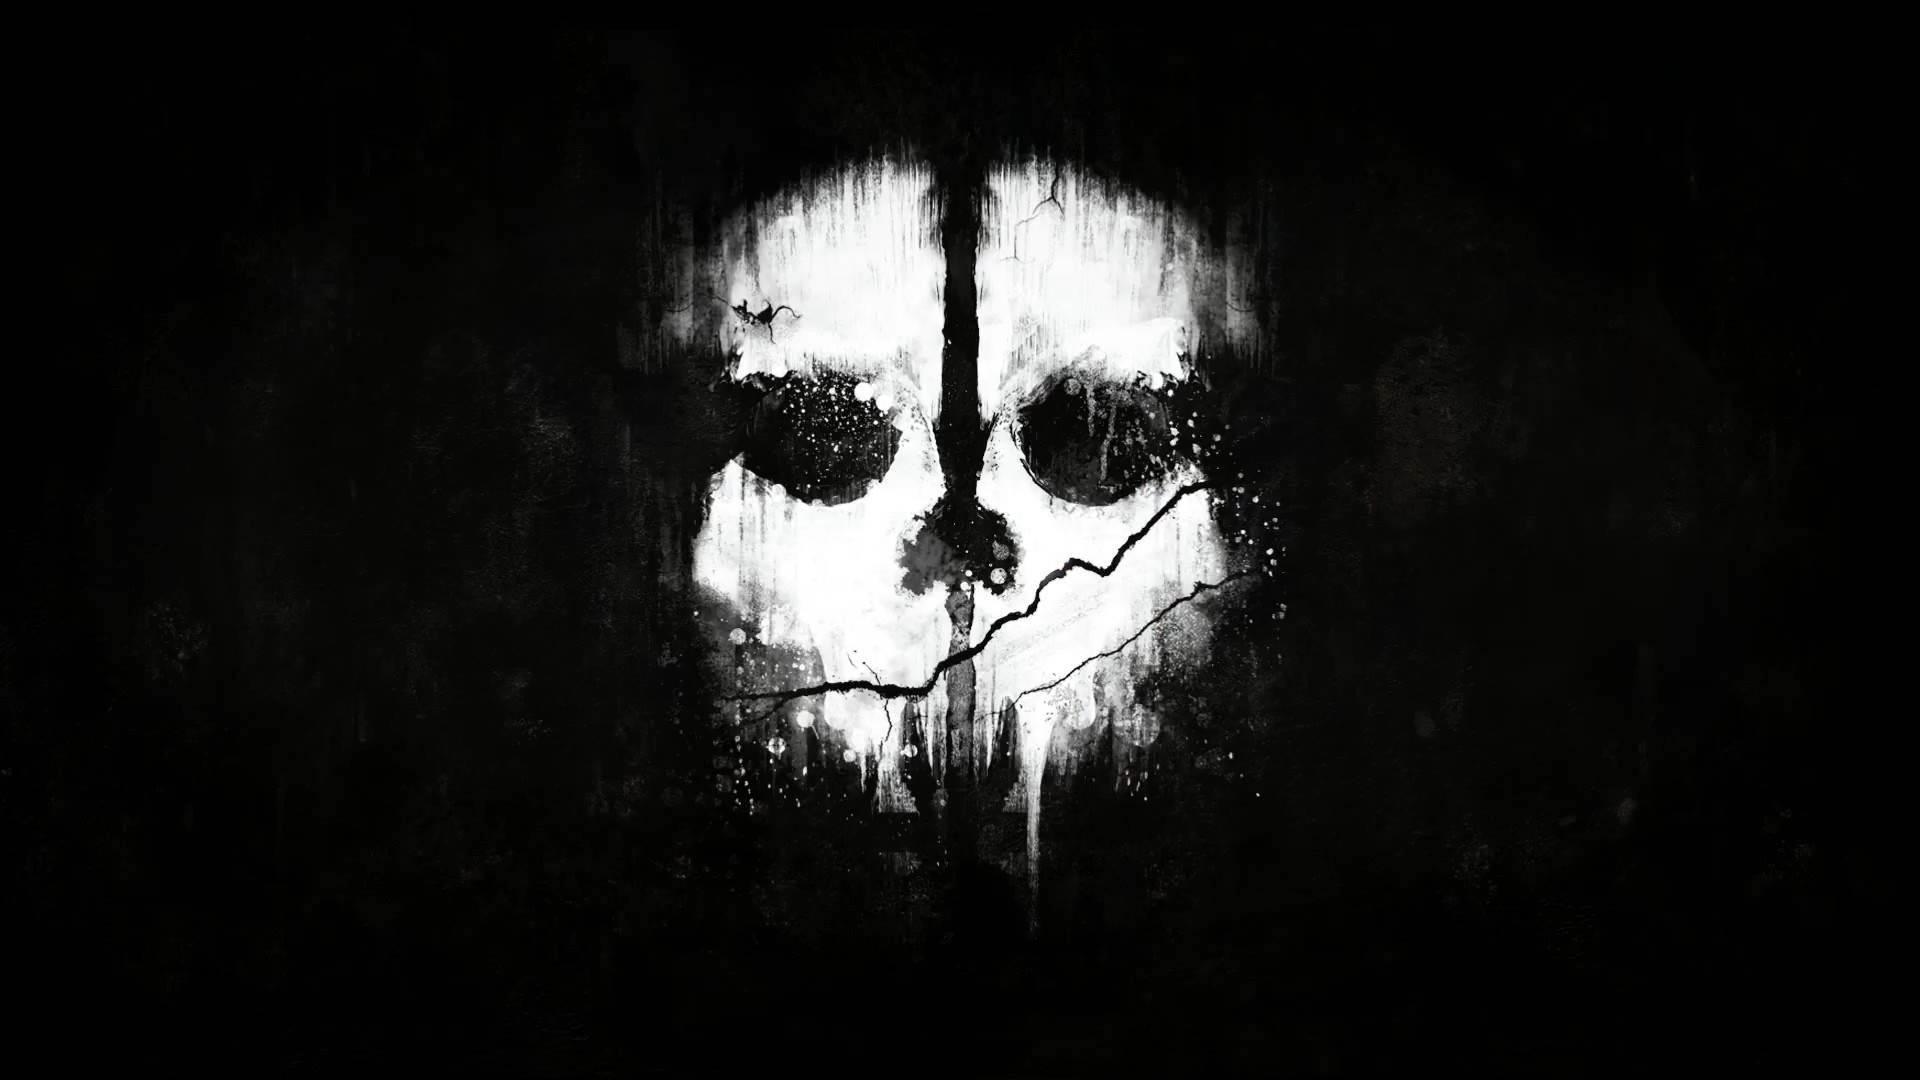 Call of Duty: Ghosts oyunu 4K duvar kağıdı